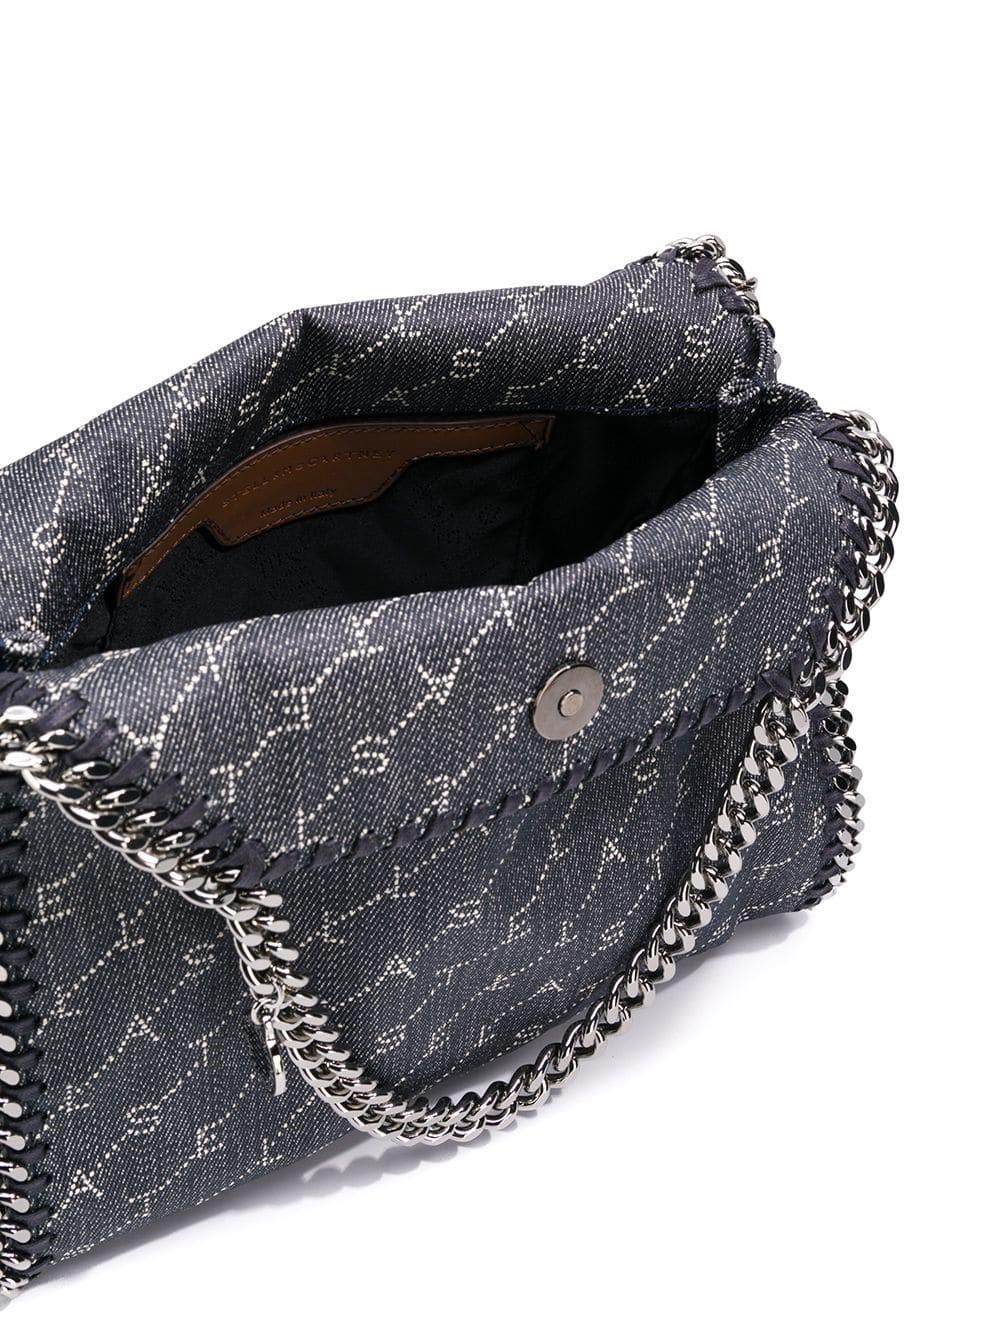 stella mccartney borsa falabella stampa logo su